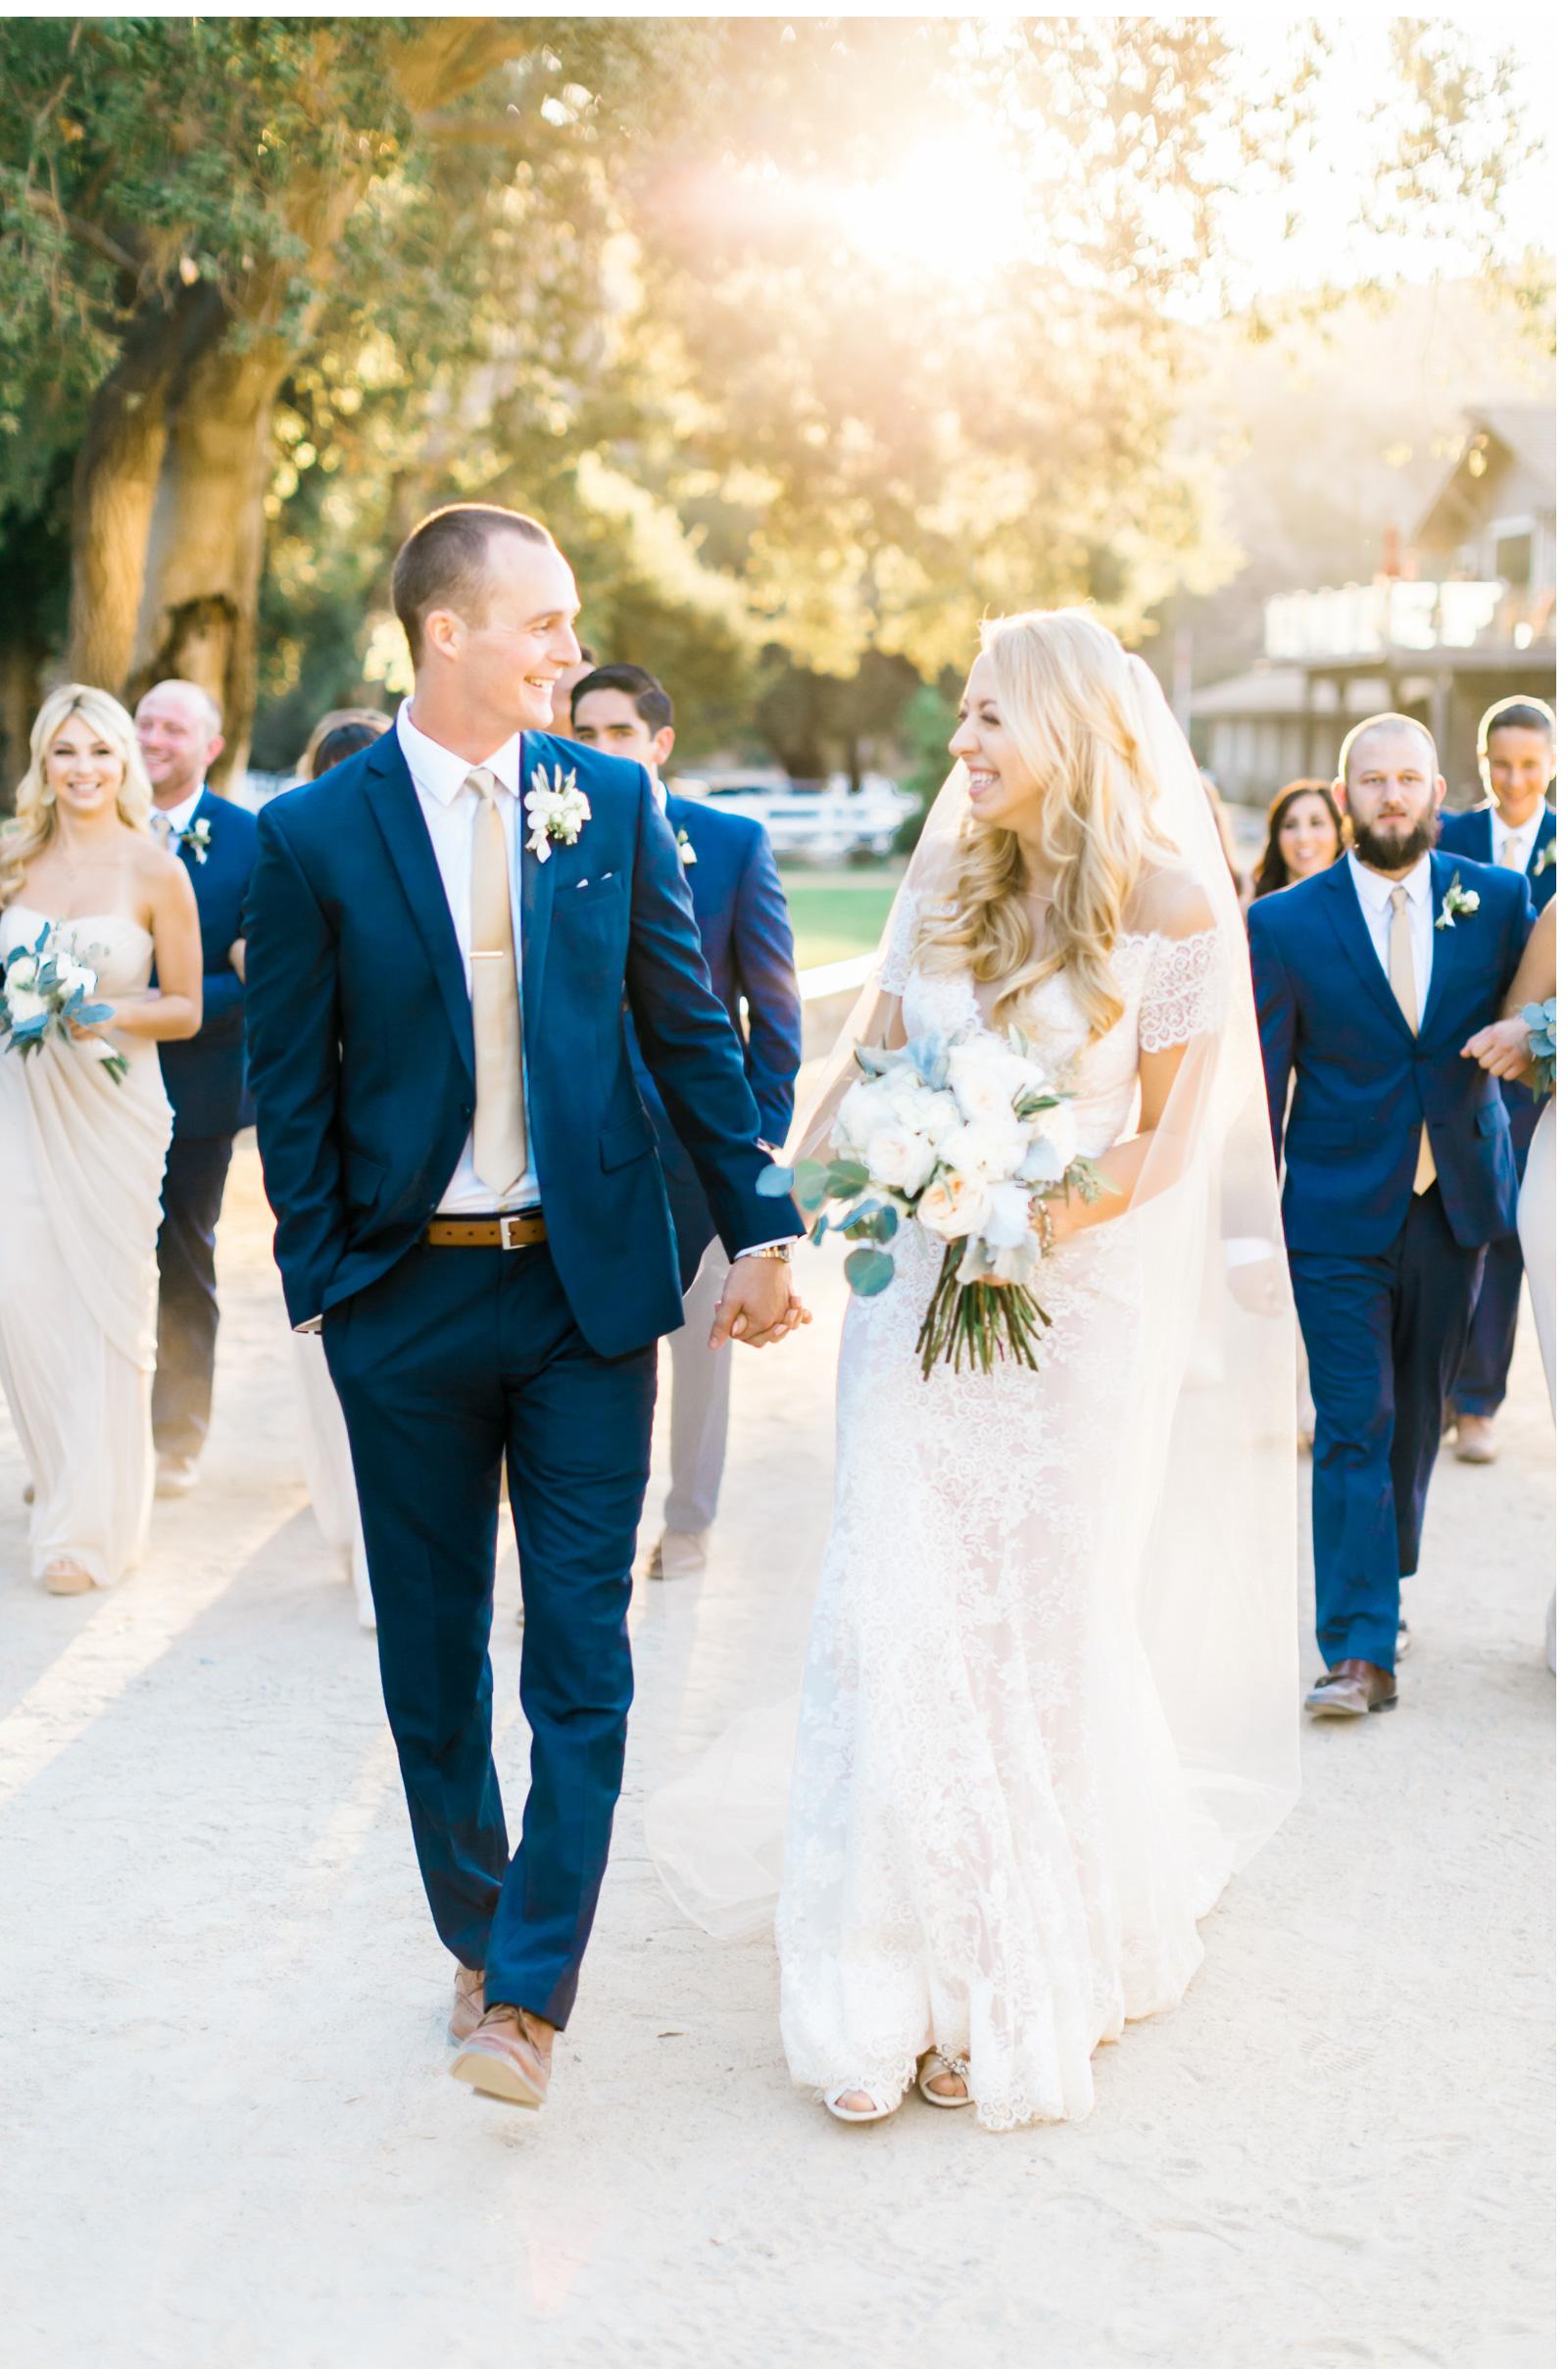 Style-Me-Pretty-Wedding-Photographer-Natalie-Schutt-Photography-Calfornia-San-Luis-Obispo_14.jpg